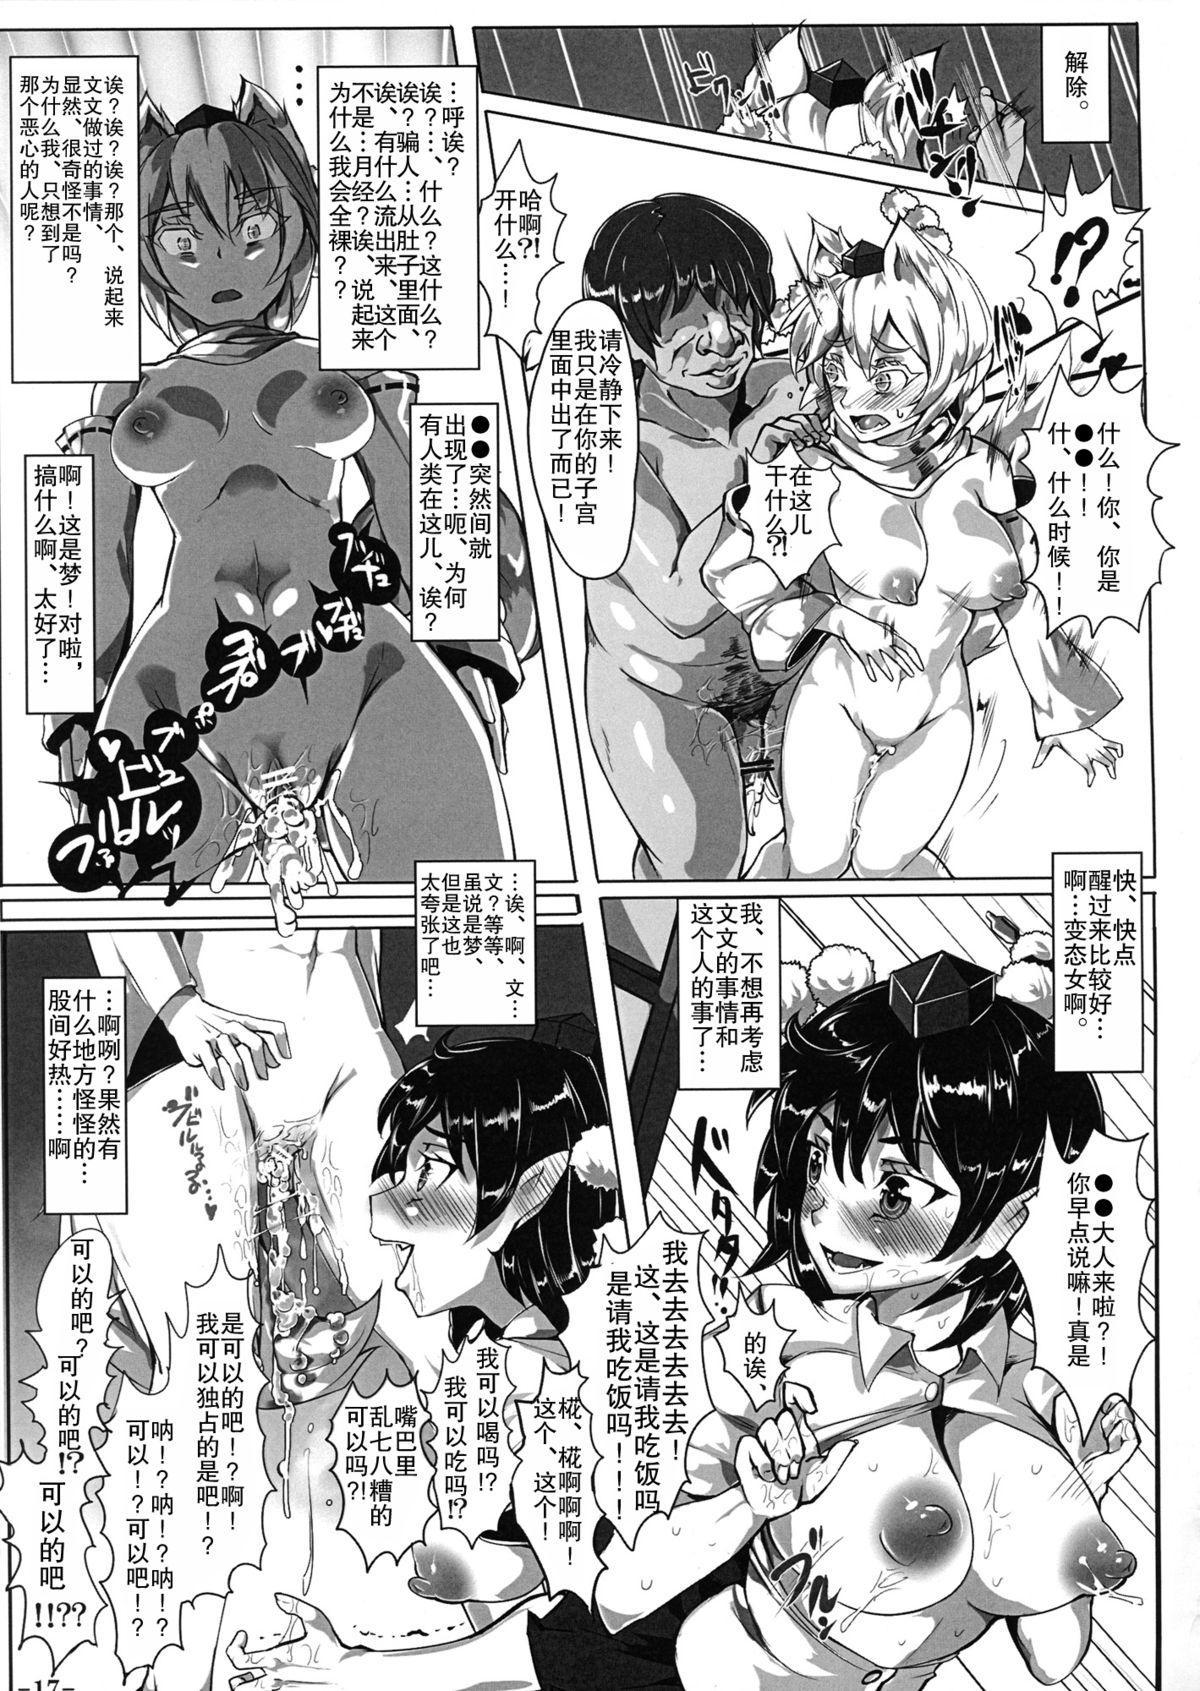 (Reitaisai 10) [Nyuu Koubou (Nyuu)] Saimin Nante Kakaranai!!! (Touhou Project)) [Chinese] [后悔的神官个人汉化] 18